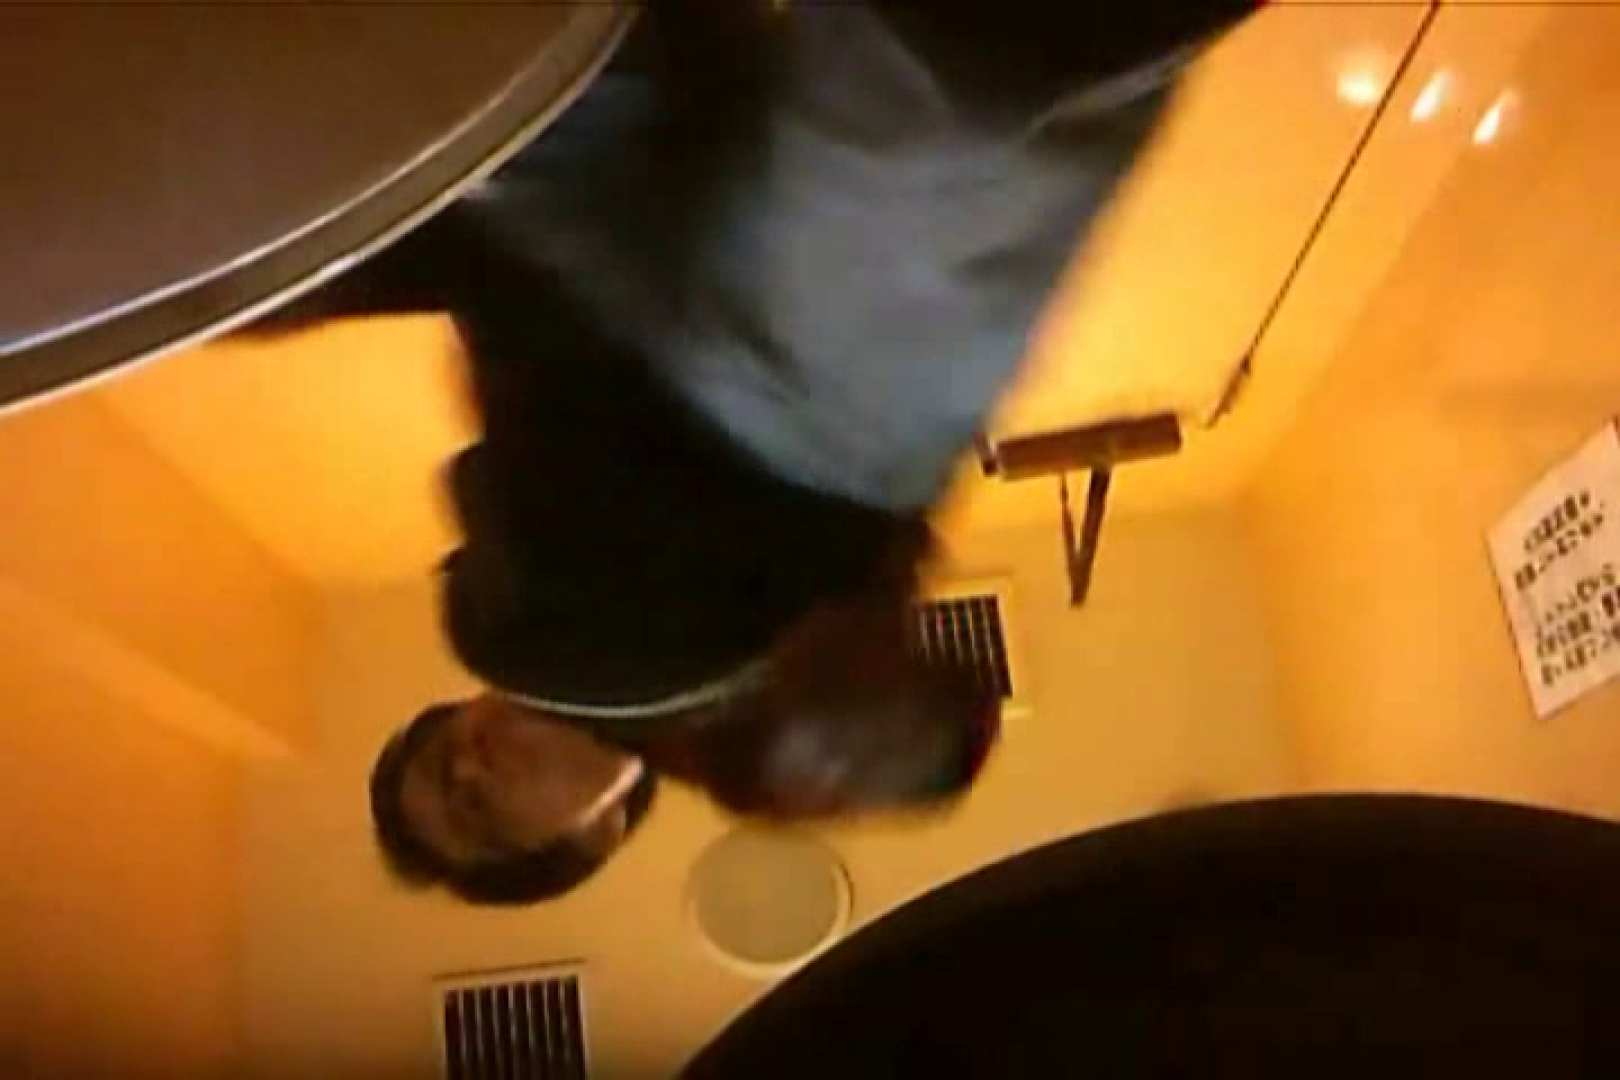 SEASON 2ND!掴み取りさんの洗面所覗き!in新幹線!VOL.17 おやじ熊系な男たち ゲイエロ画像 90連発 85